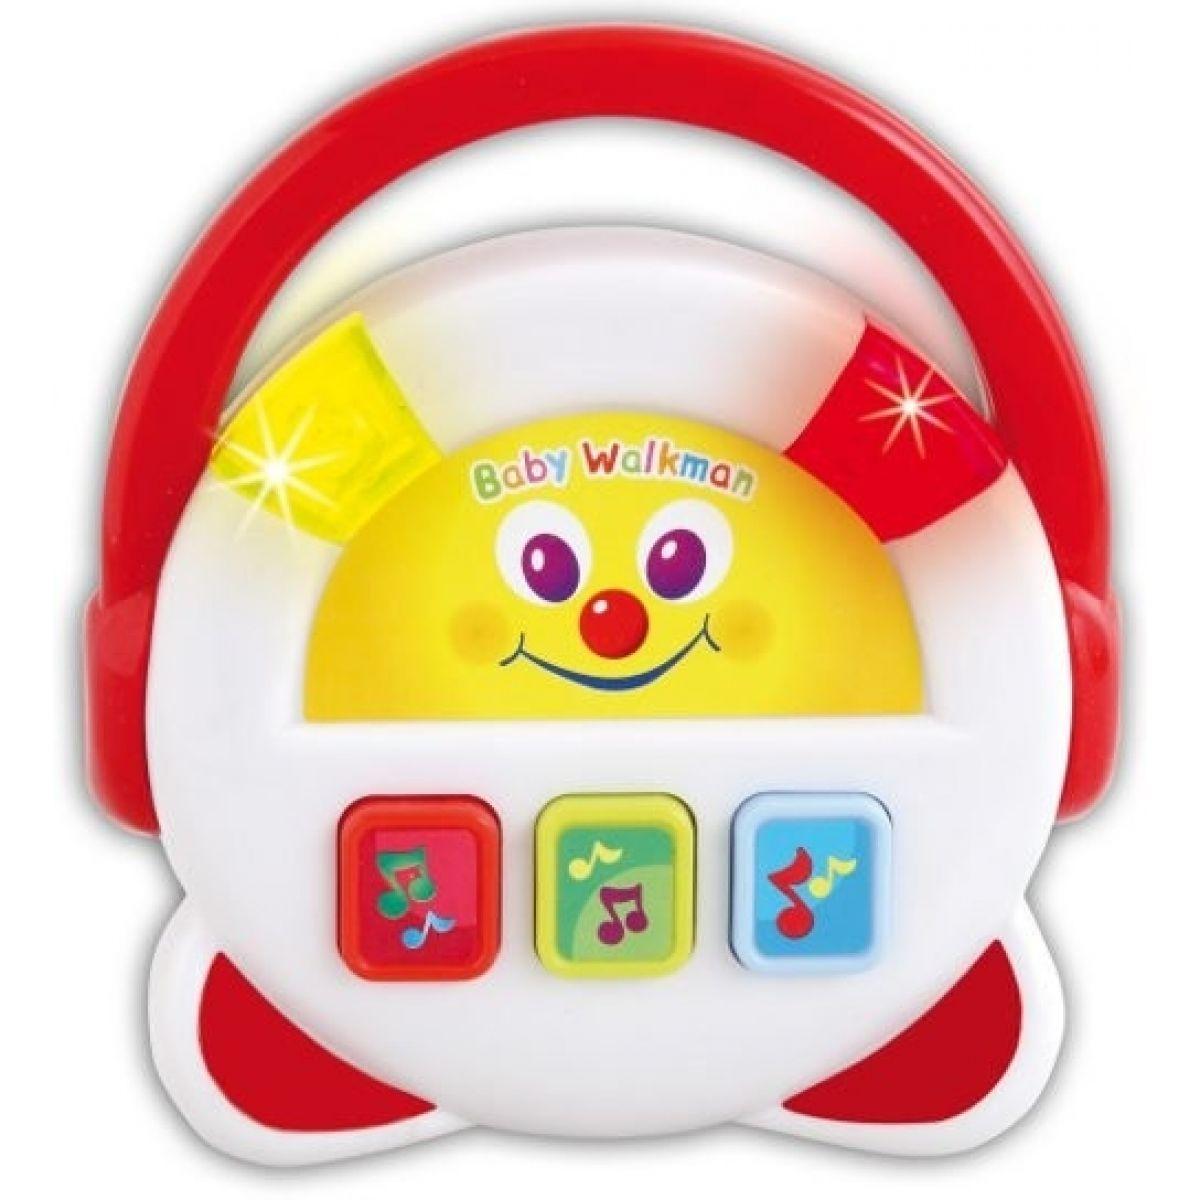 Baby Walkman Bontempi